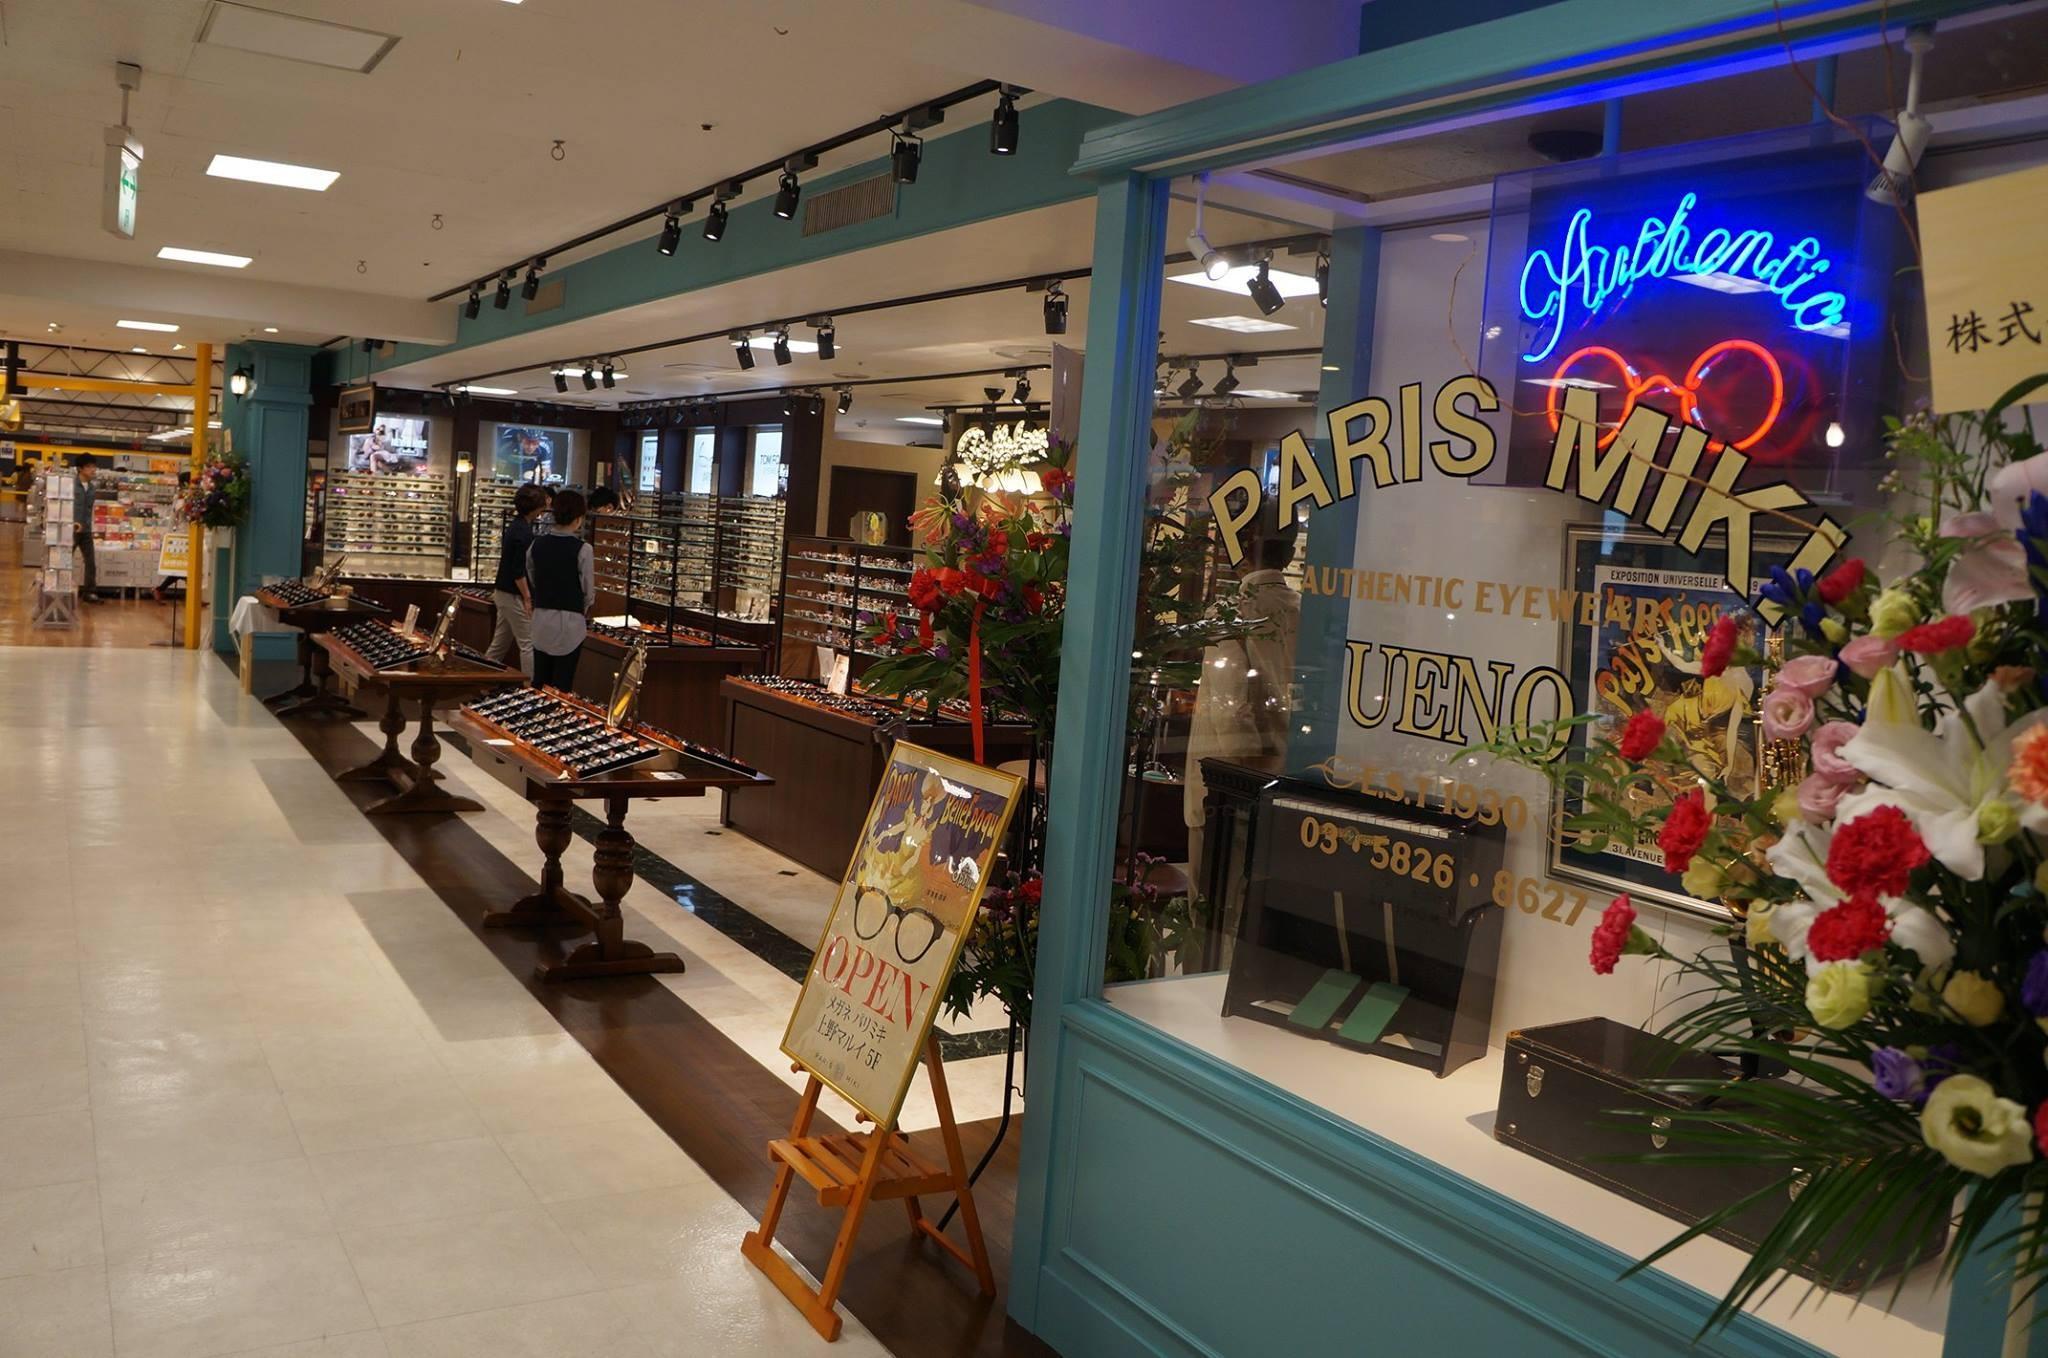 OPTIQUE PARIS MIKI イオンスーパーセンター一関店 のアルバイト情報